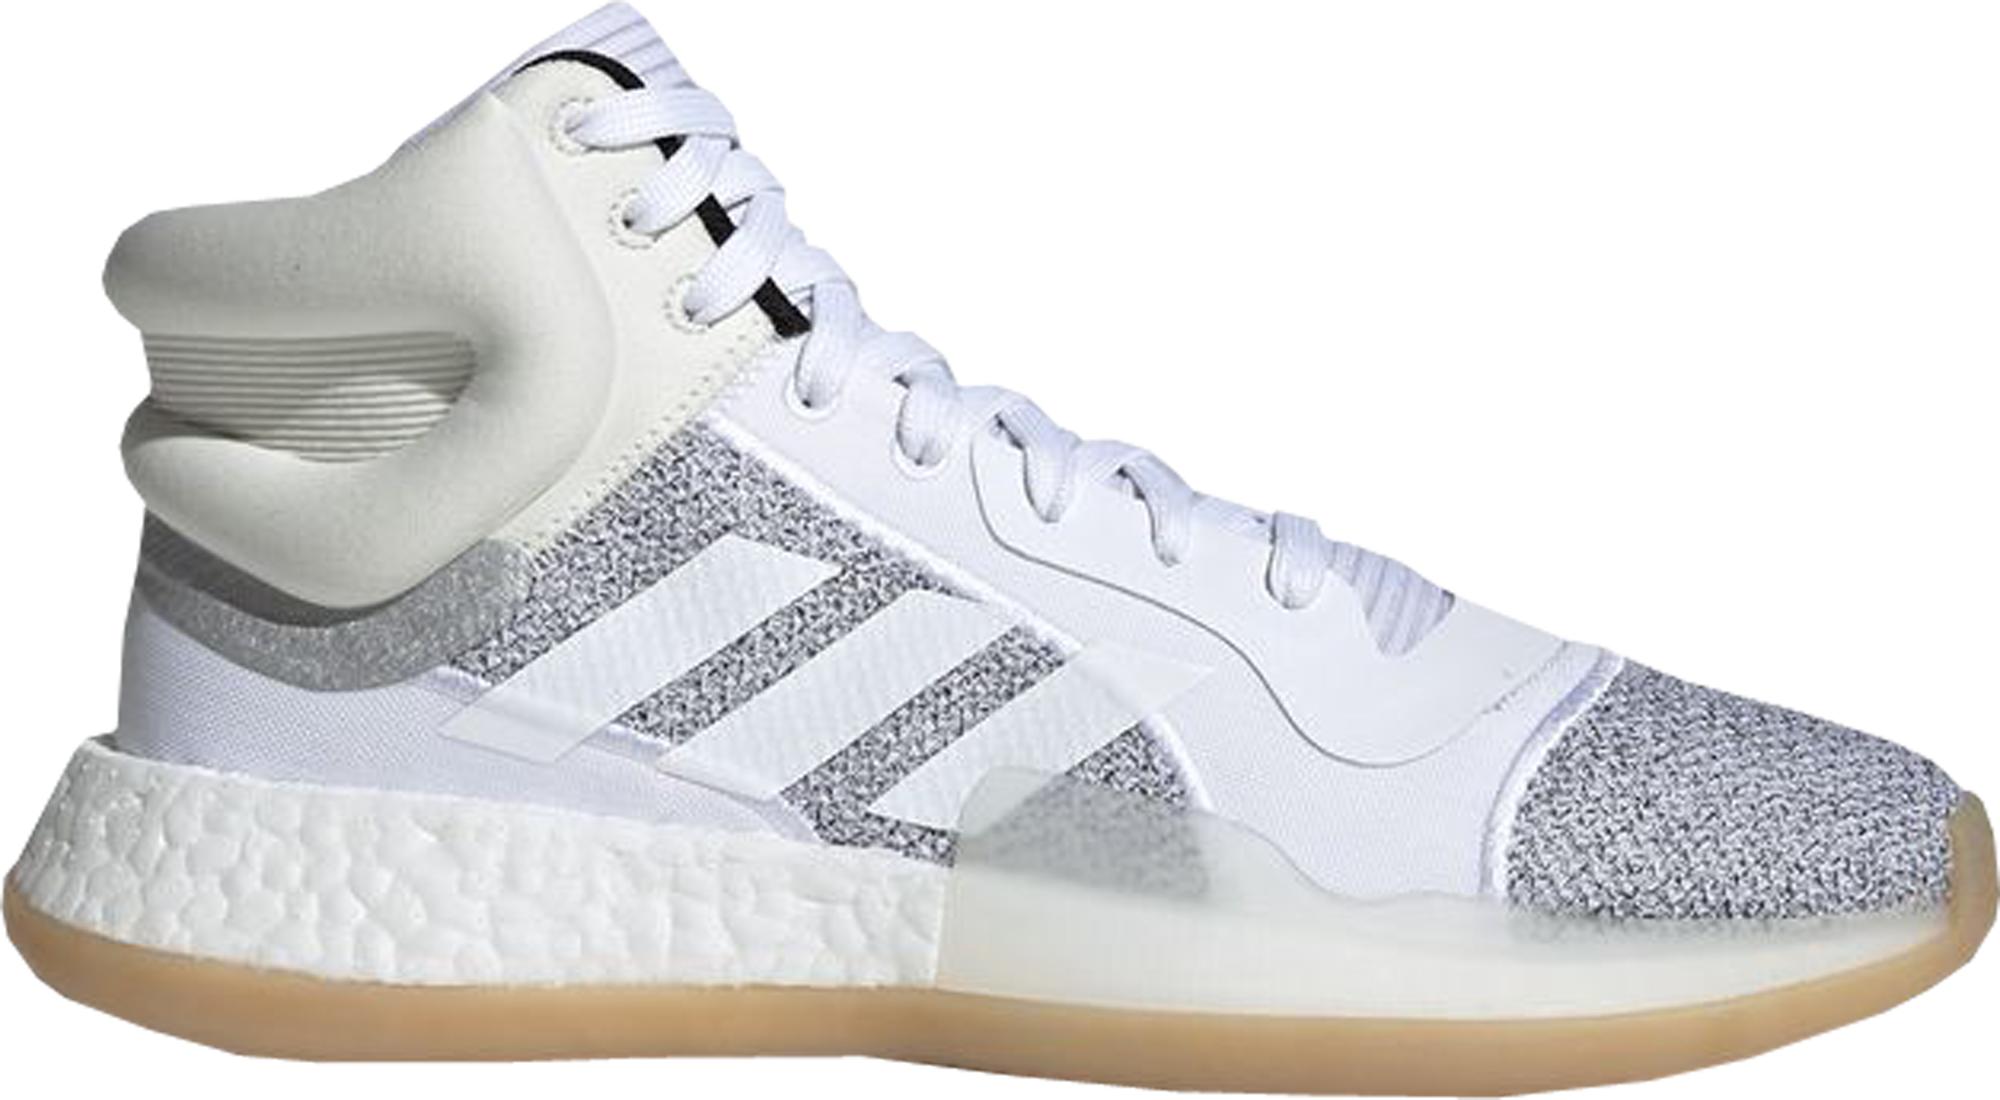 adidas Marquee Boost Raw White Cloud White